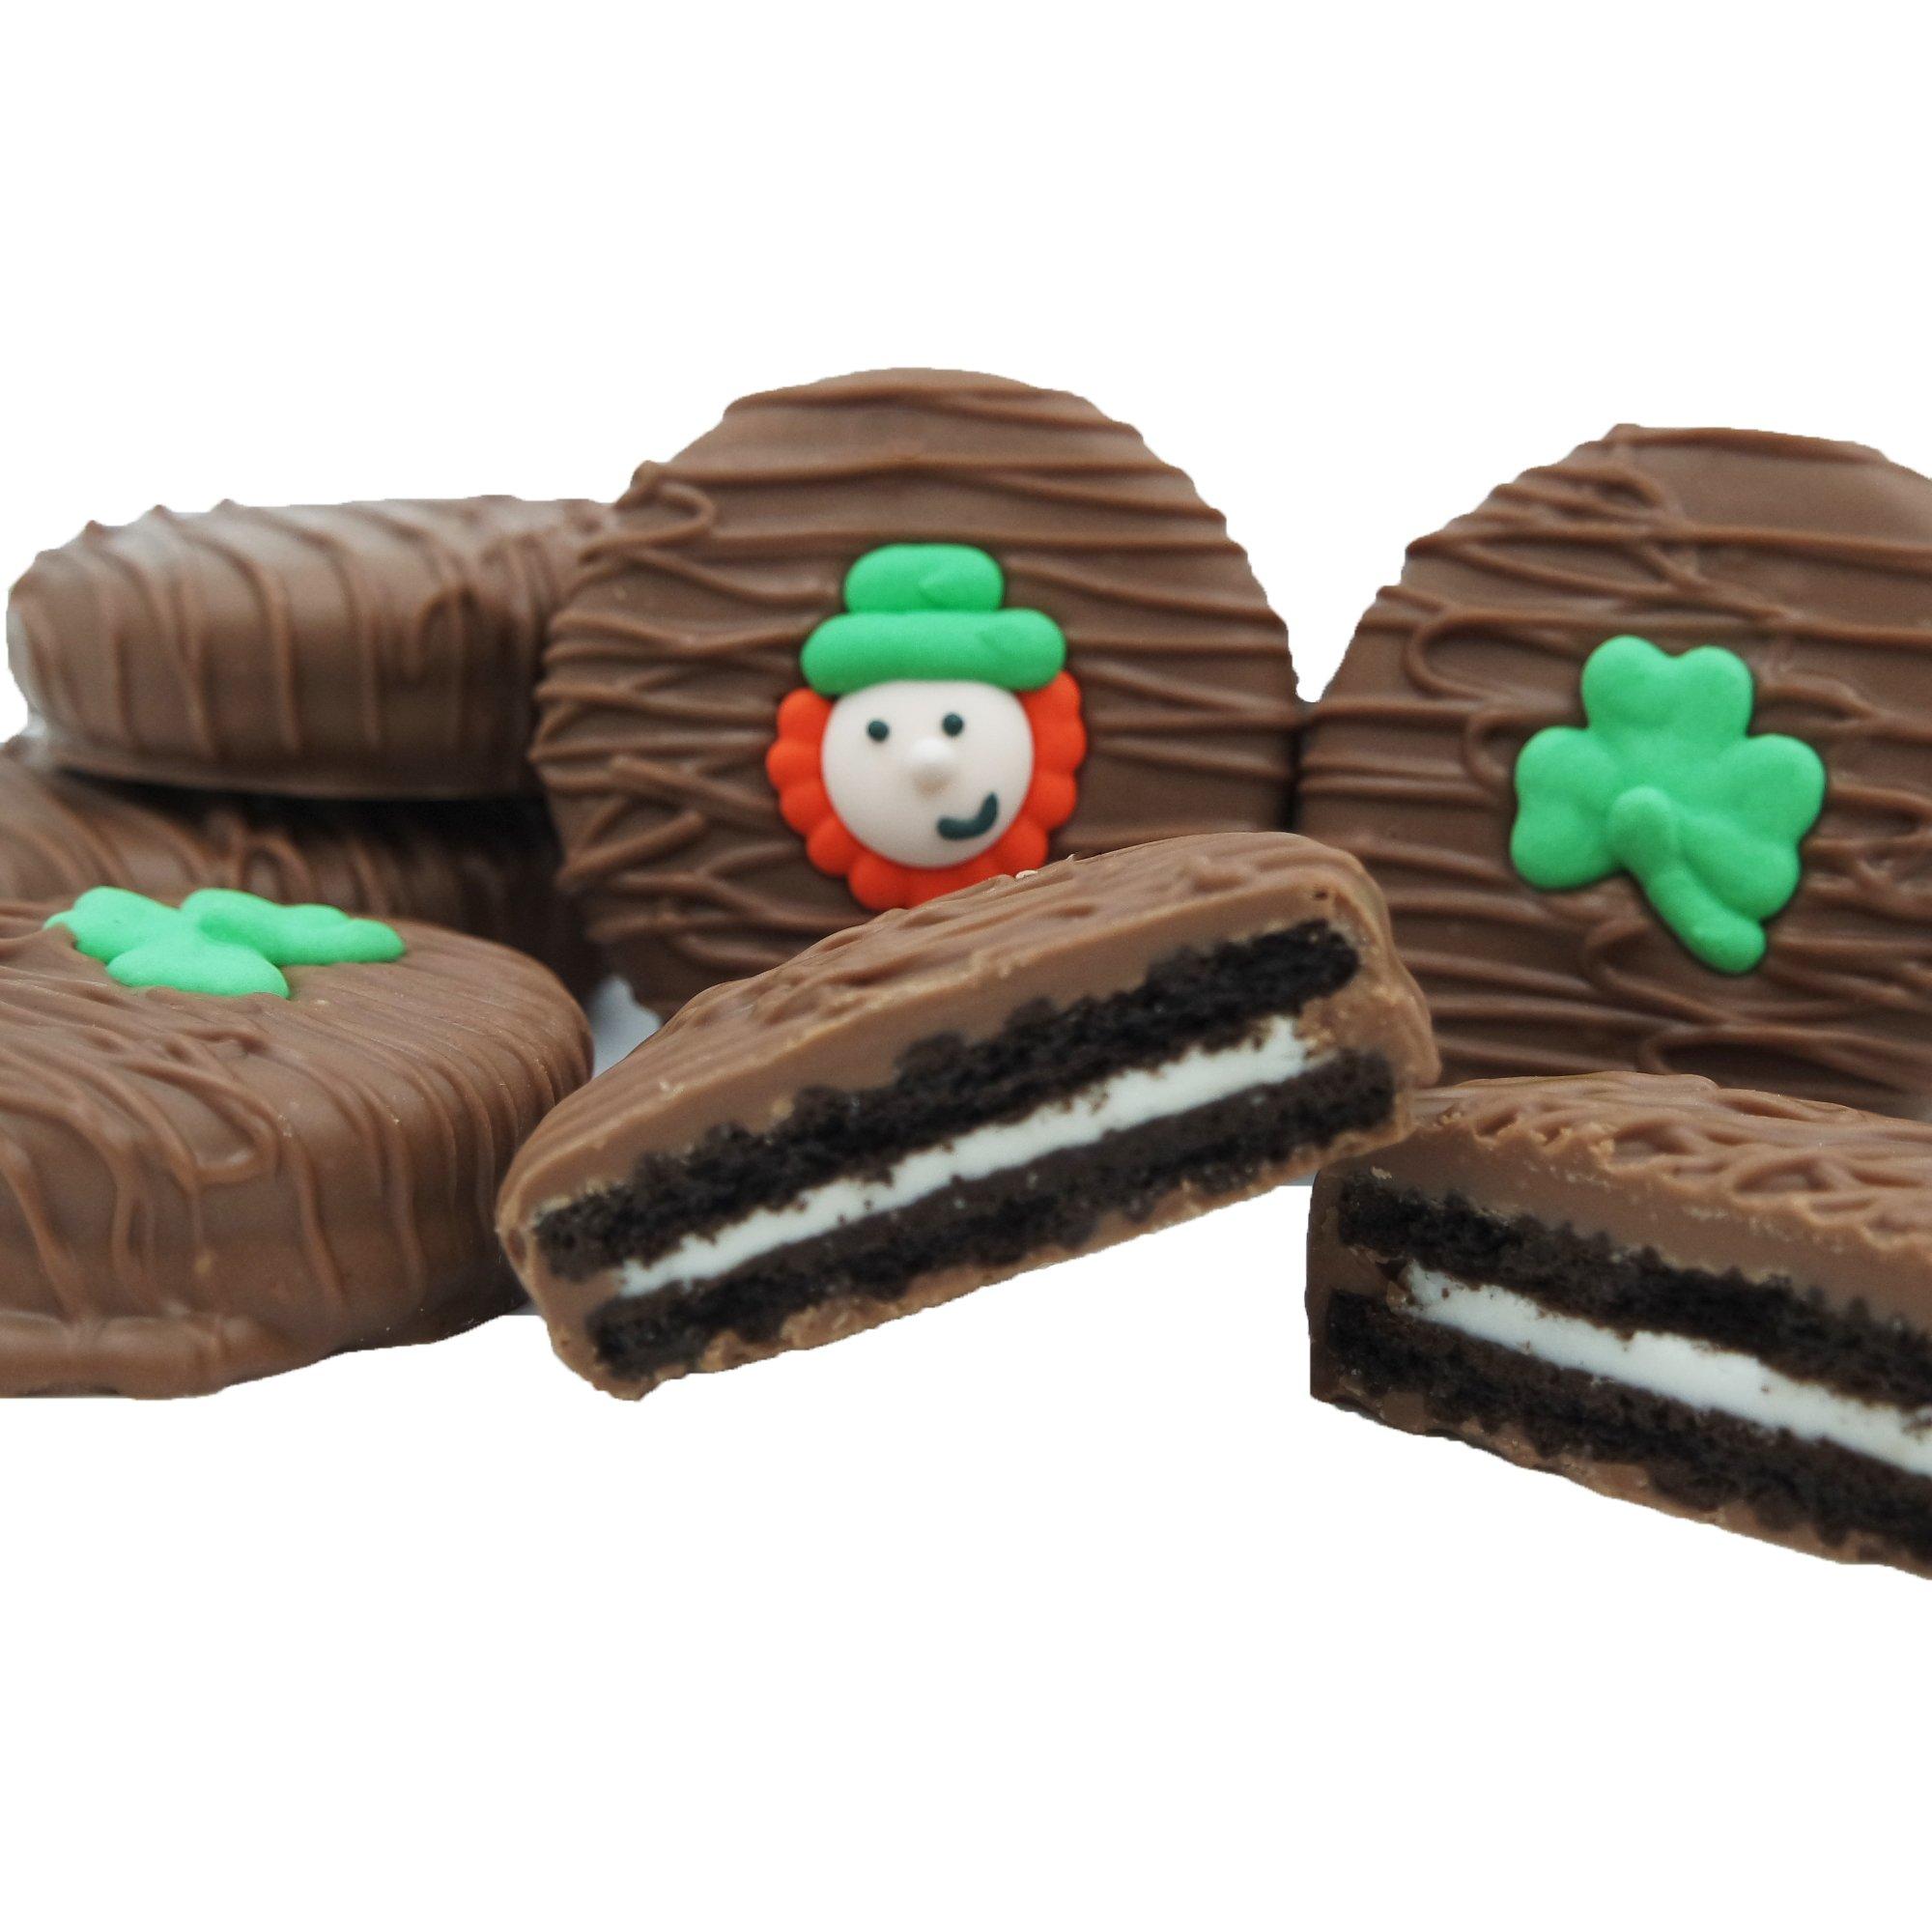 Philadelphia Candies Milk Chocolate Covered OREO Cookies, St. Patrick's Day Gift Net Wt 8 oz